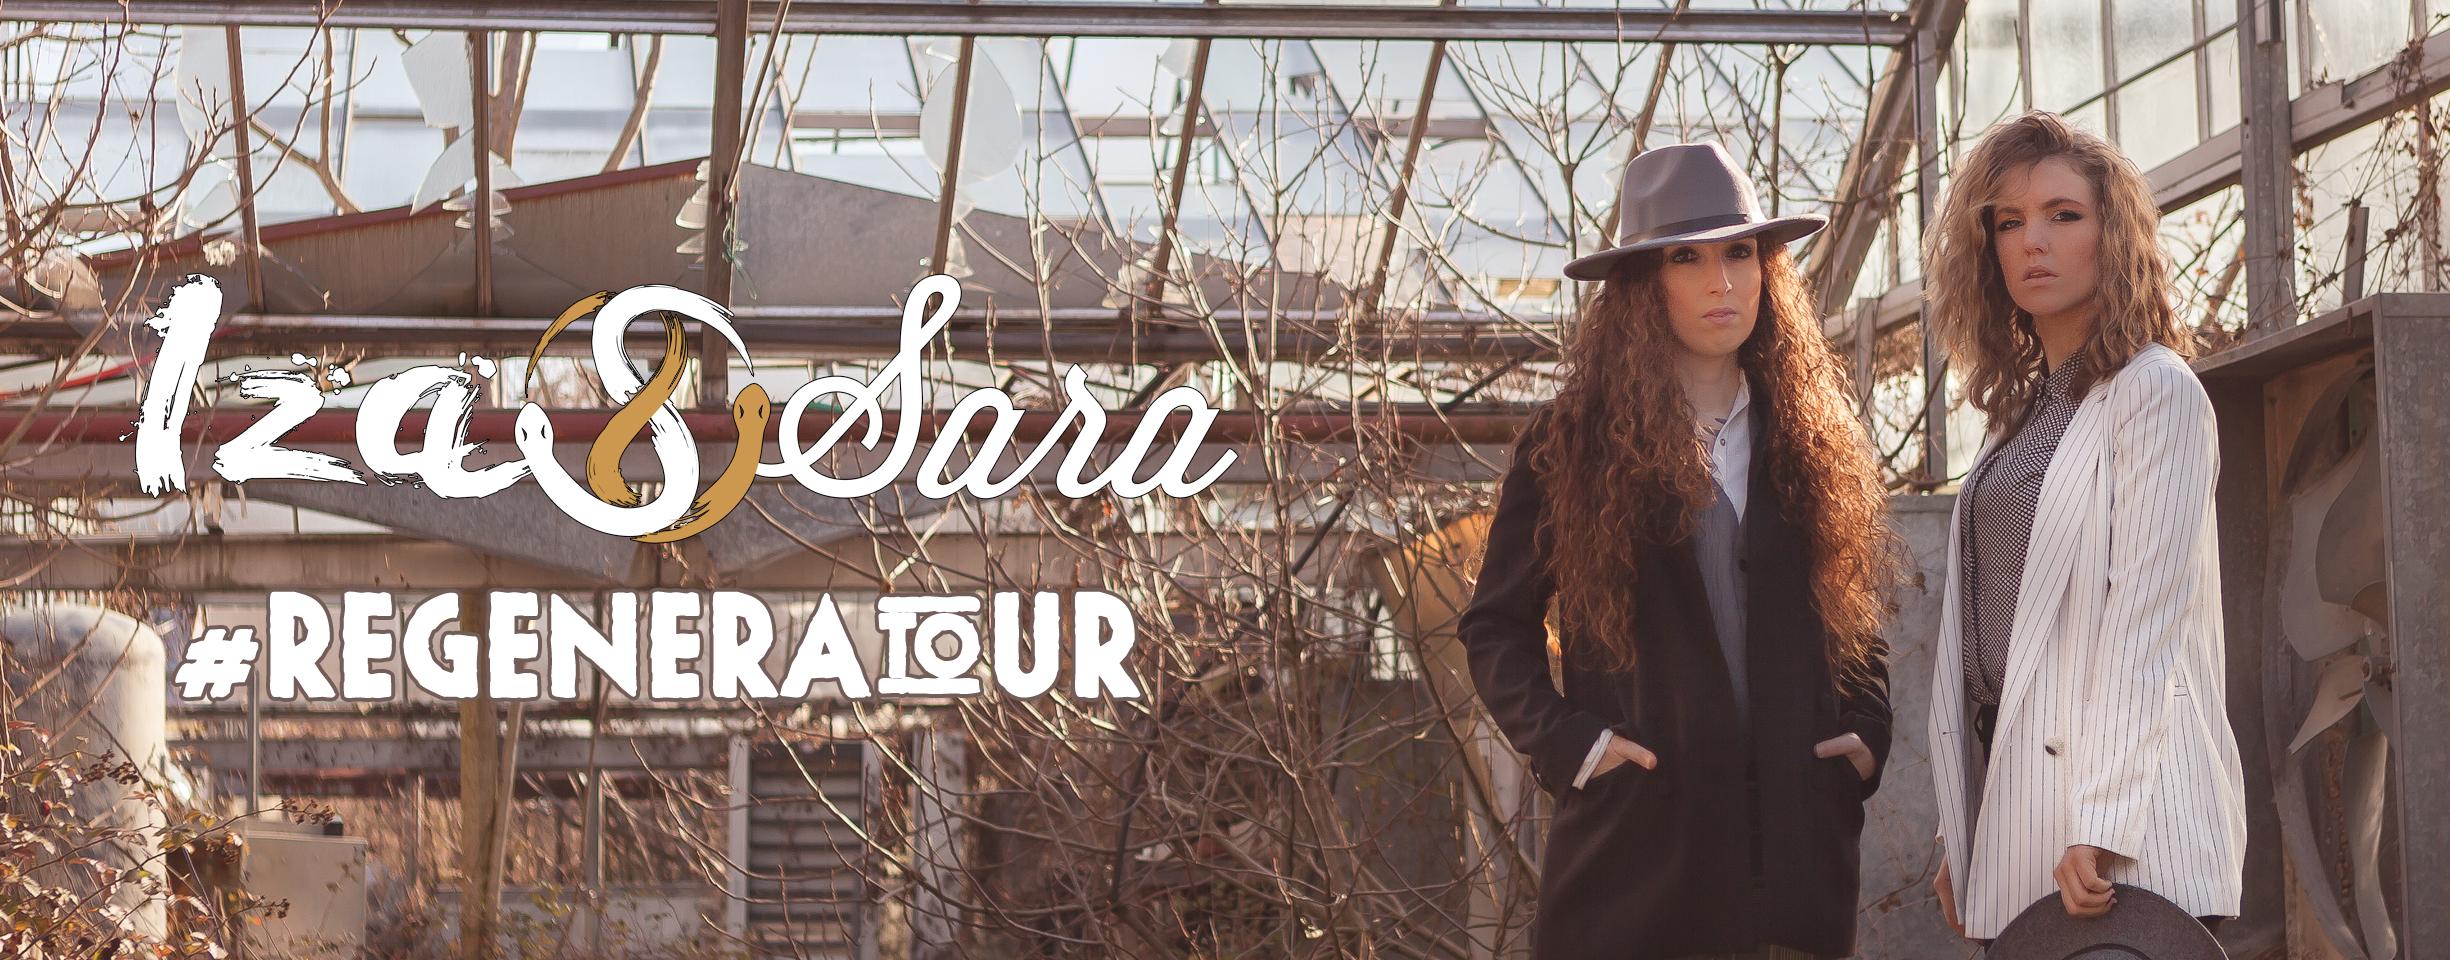 Iza&Sara #REGENERATOUR – Quinta Tappa @Riolo Terme